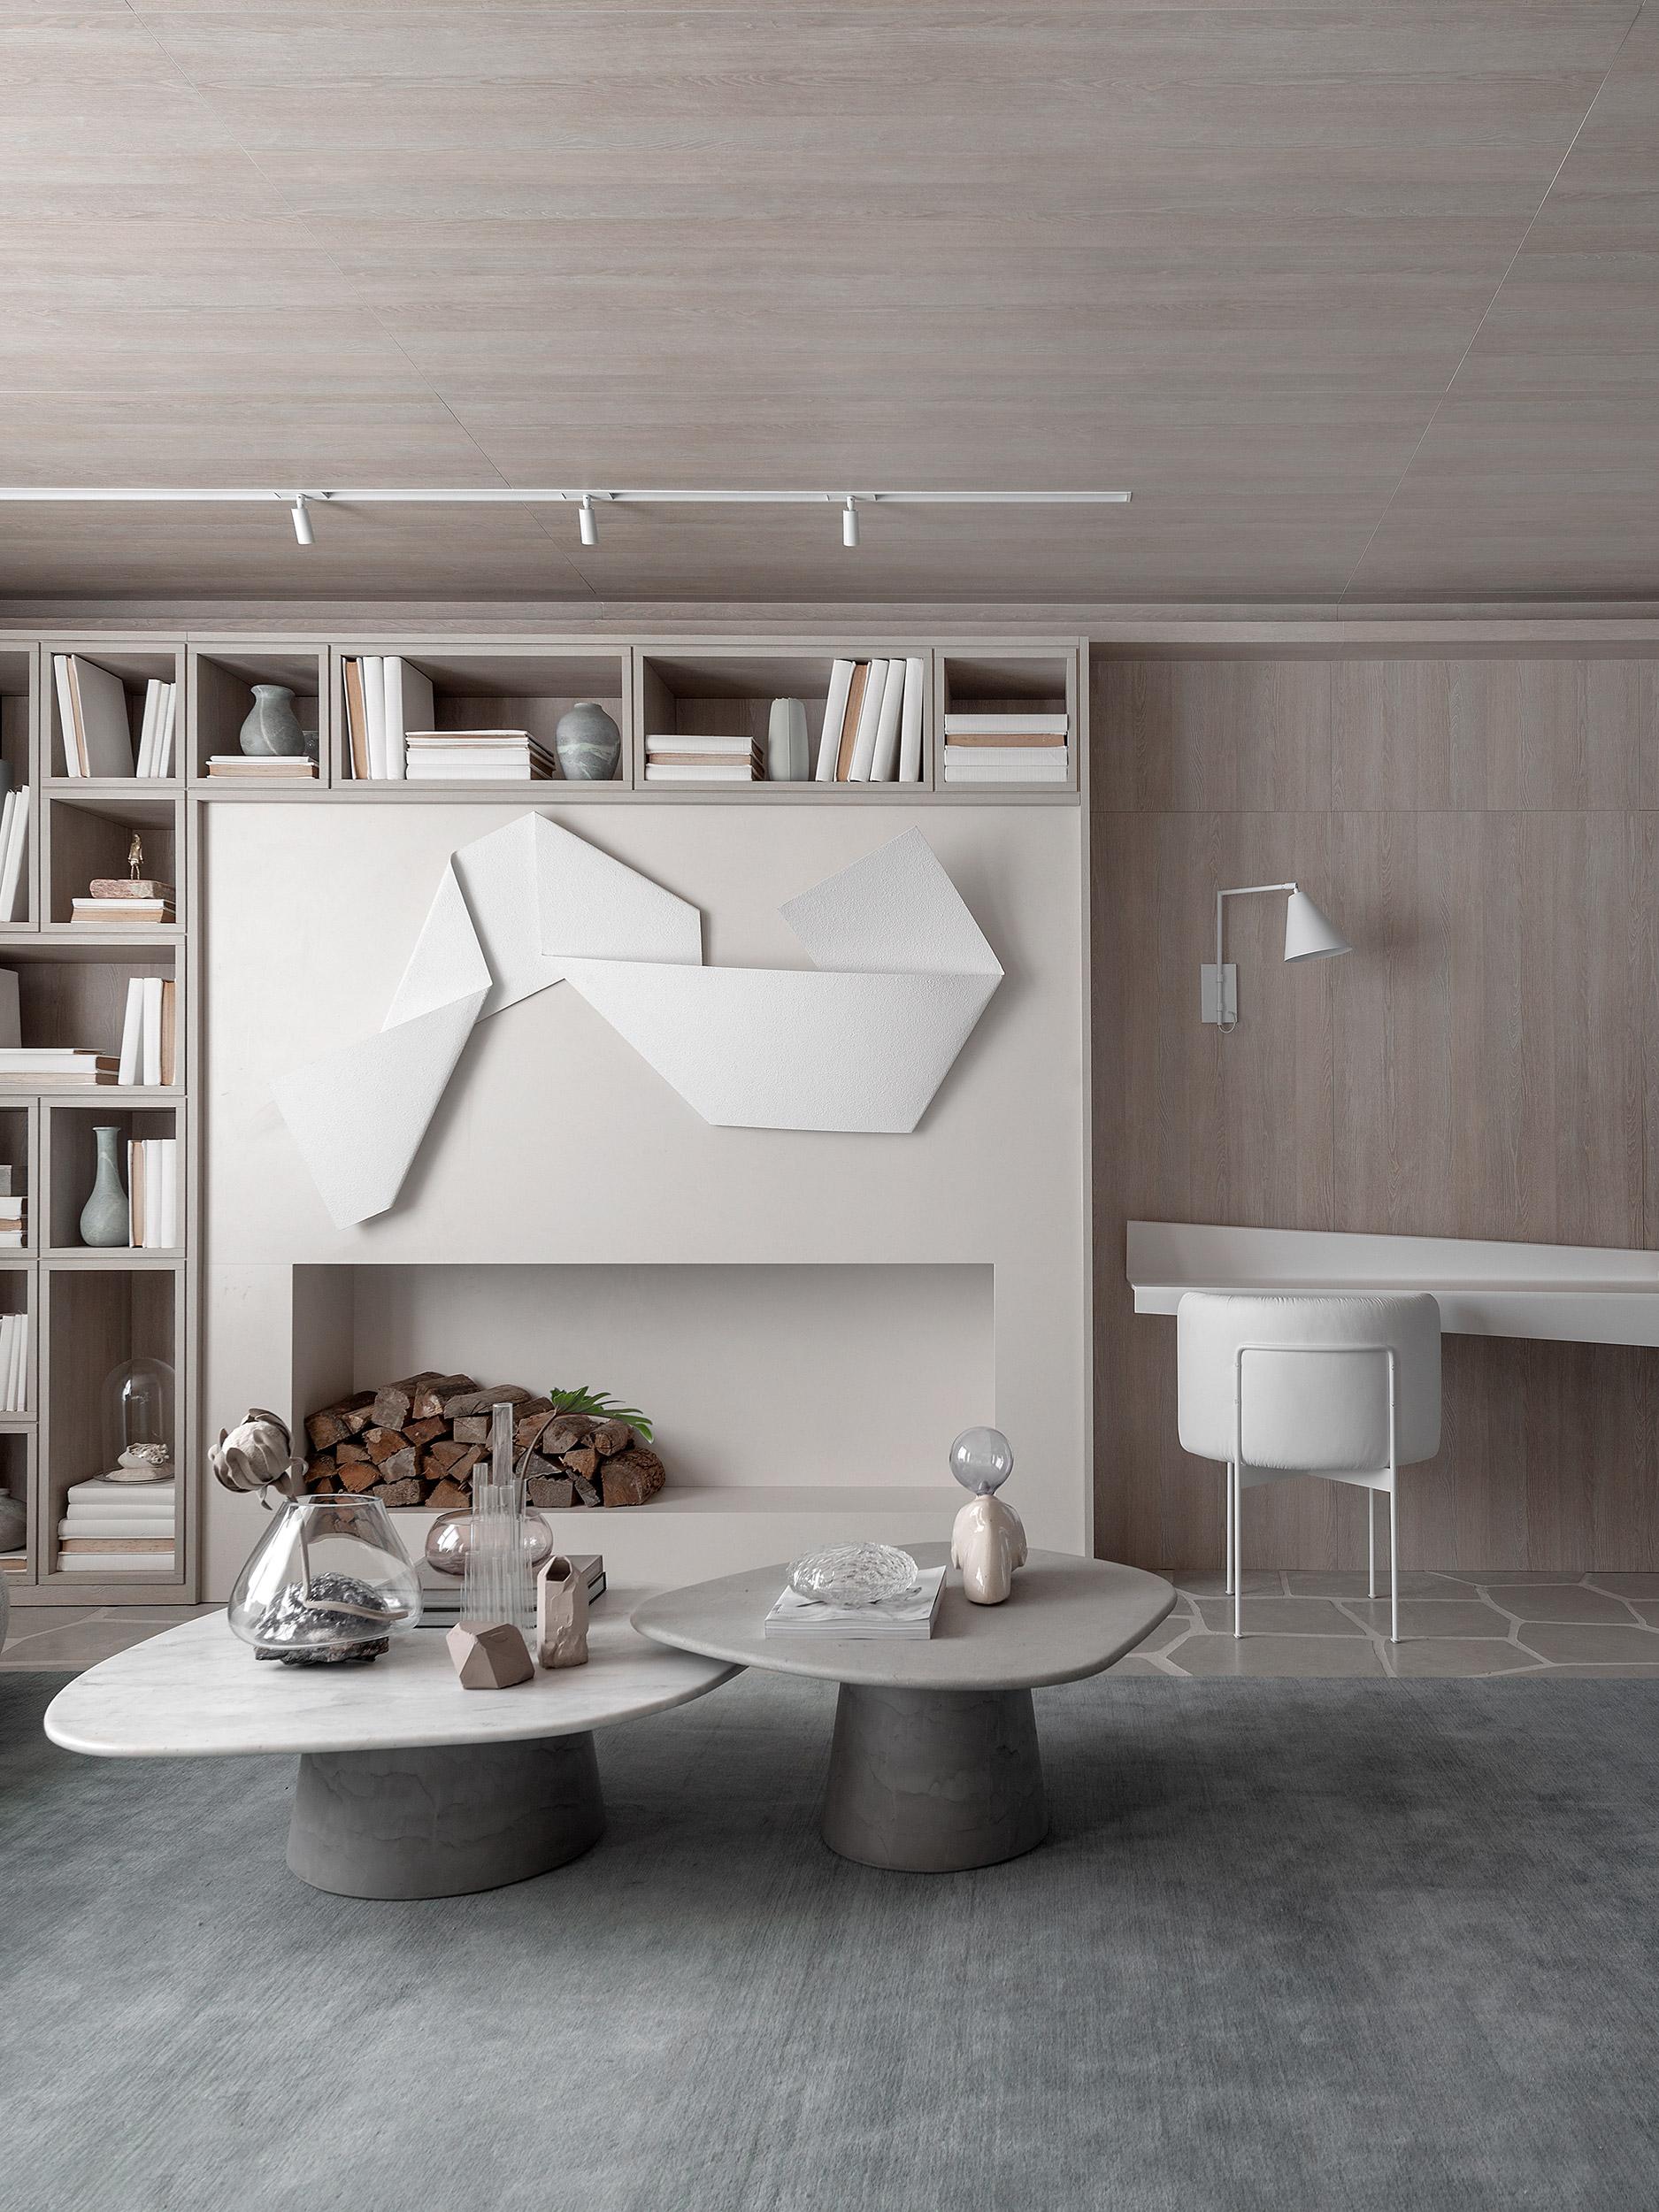 Cosmopolitan Loft - Mariana Pesca Arquitetura. Projeto da CASACOR Santa Catarina 2021.